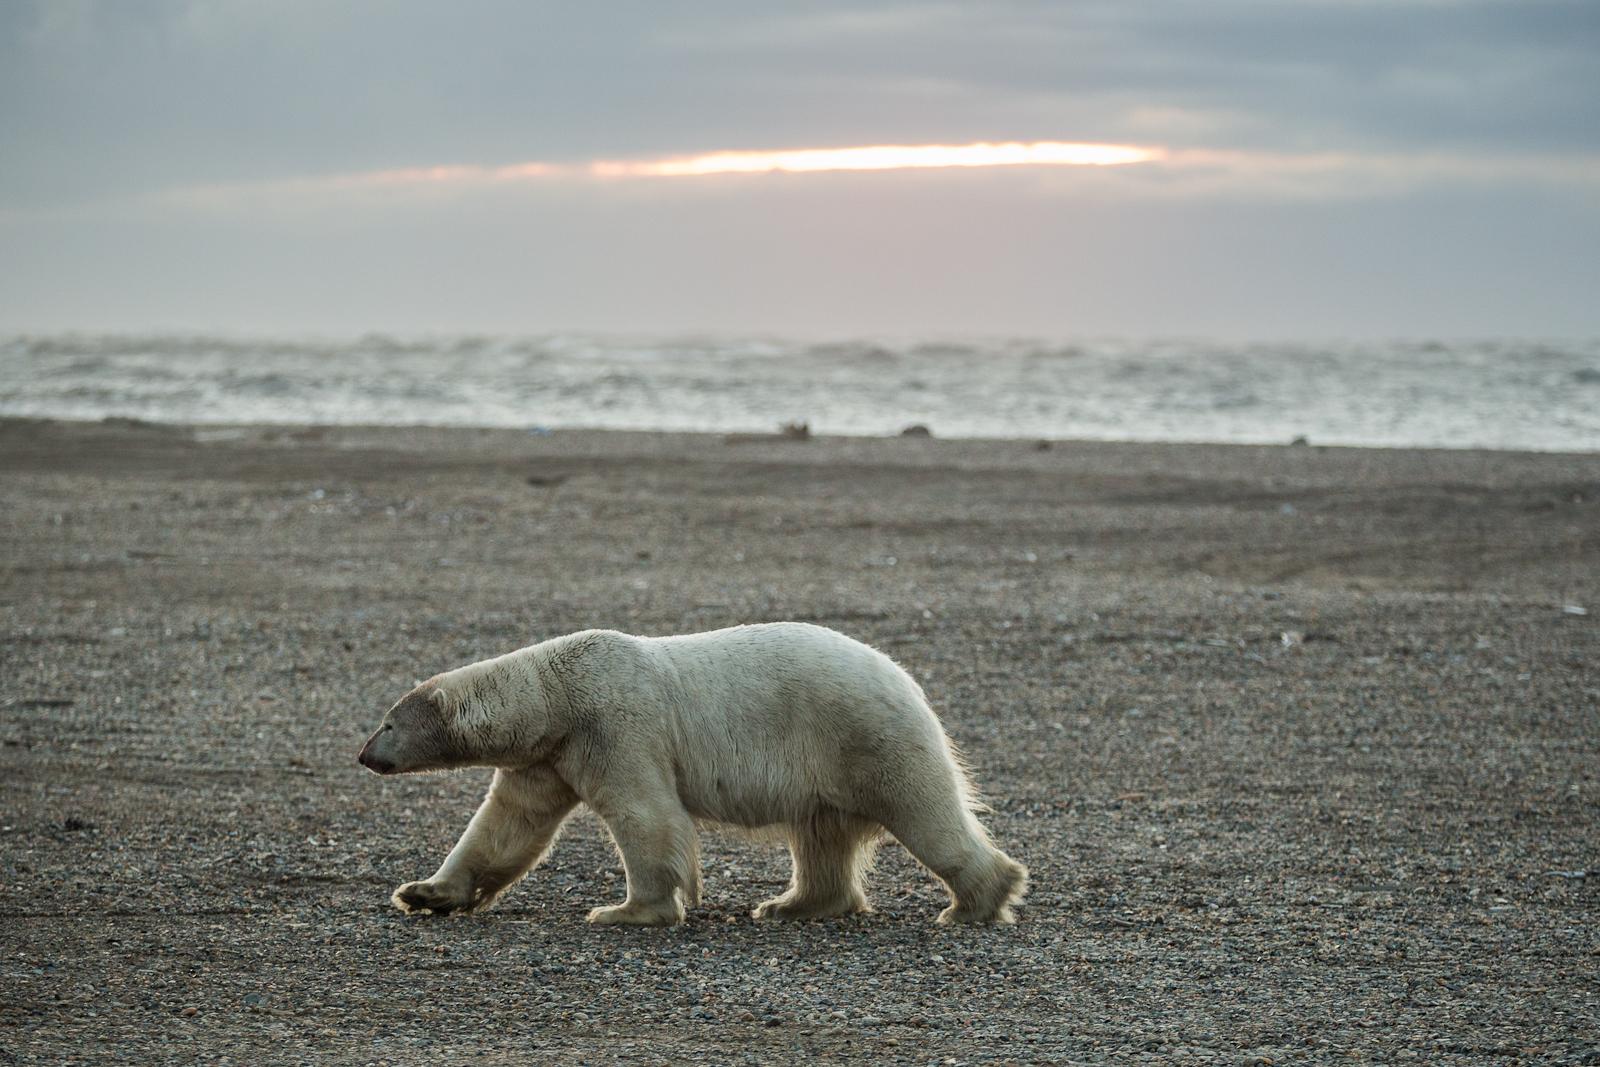 Nunavut Inuit group will lobby to lift polar bear ban, increase eastern hunt quota